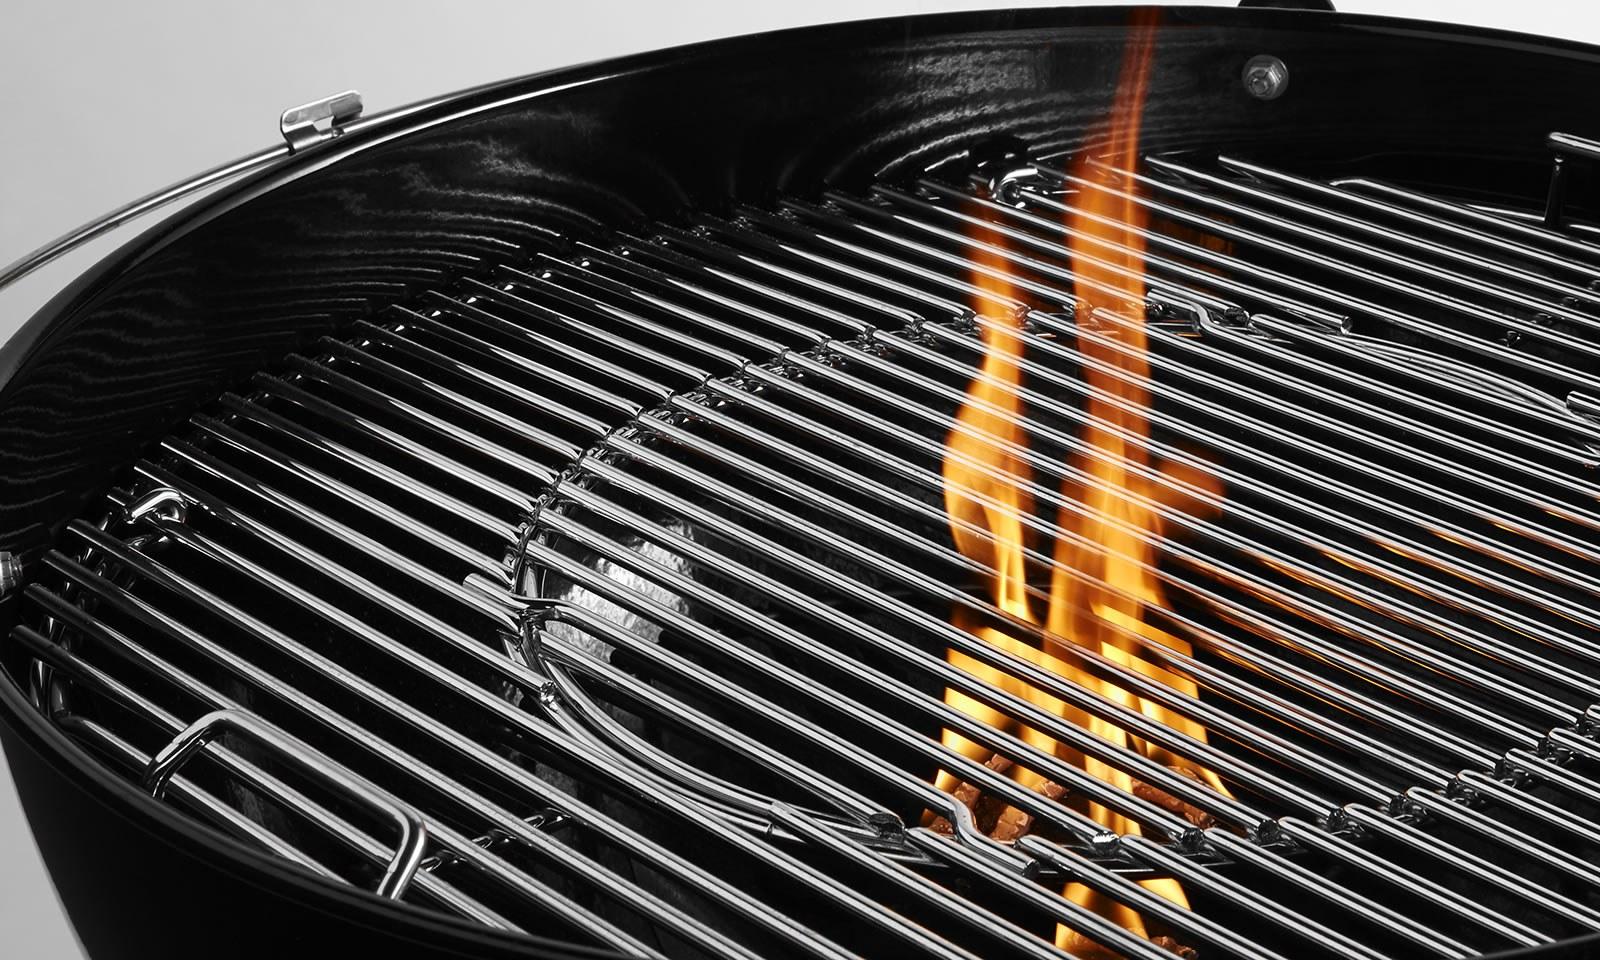 Weber Holzkohlegrill Master Touch : Weber grill master touch cm charcoal weber master touch gbs